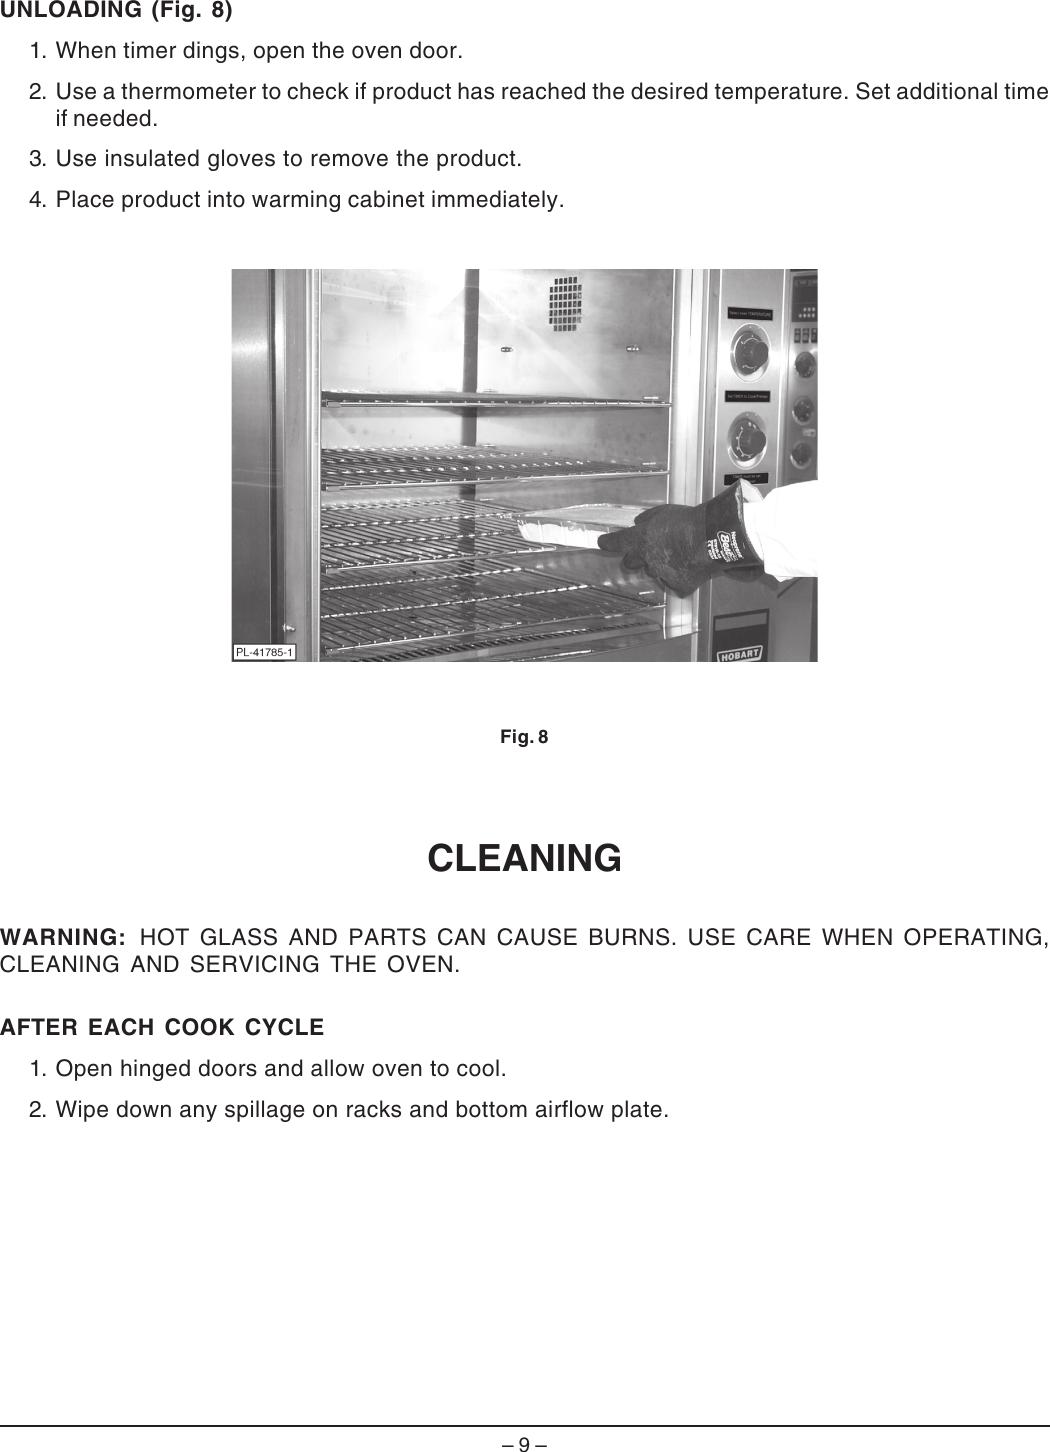 Hobart Ml 132064 Users Manual F34846.p65